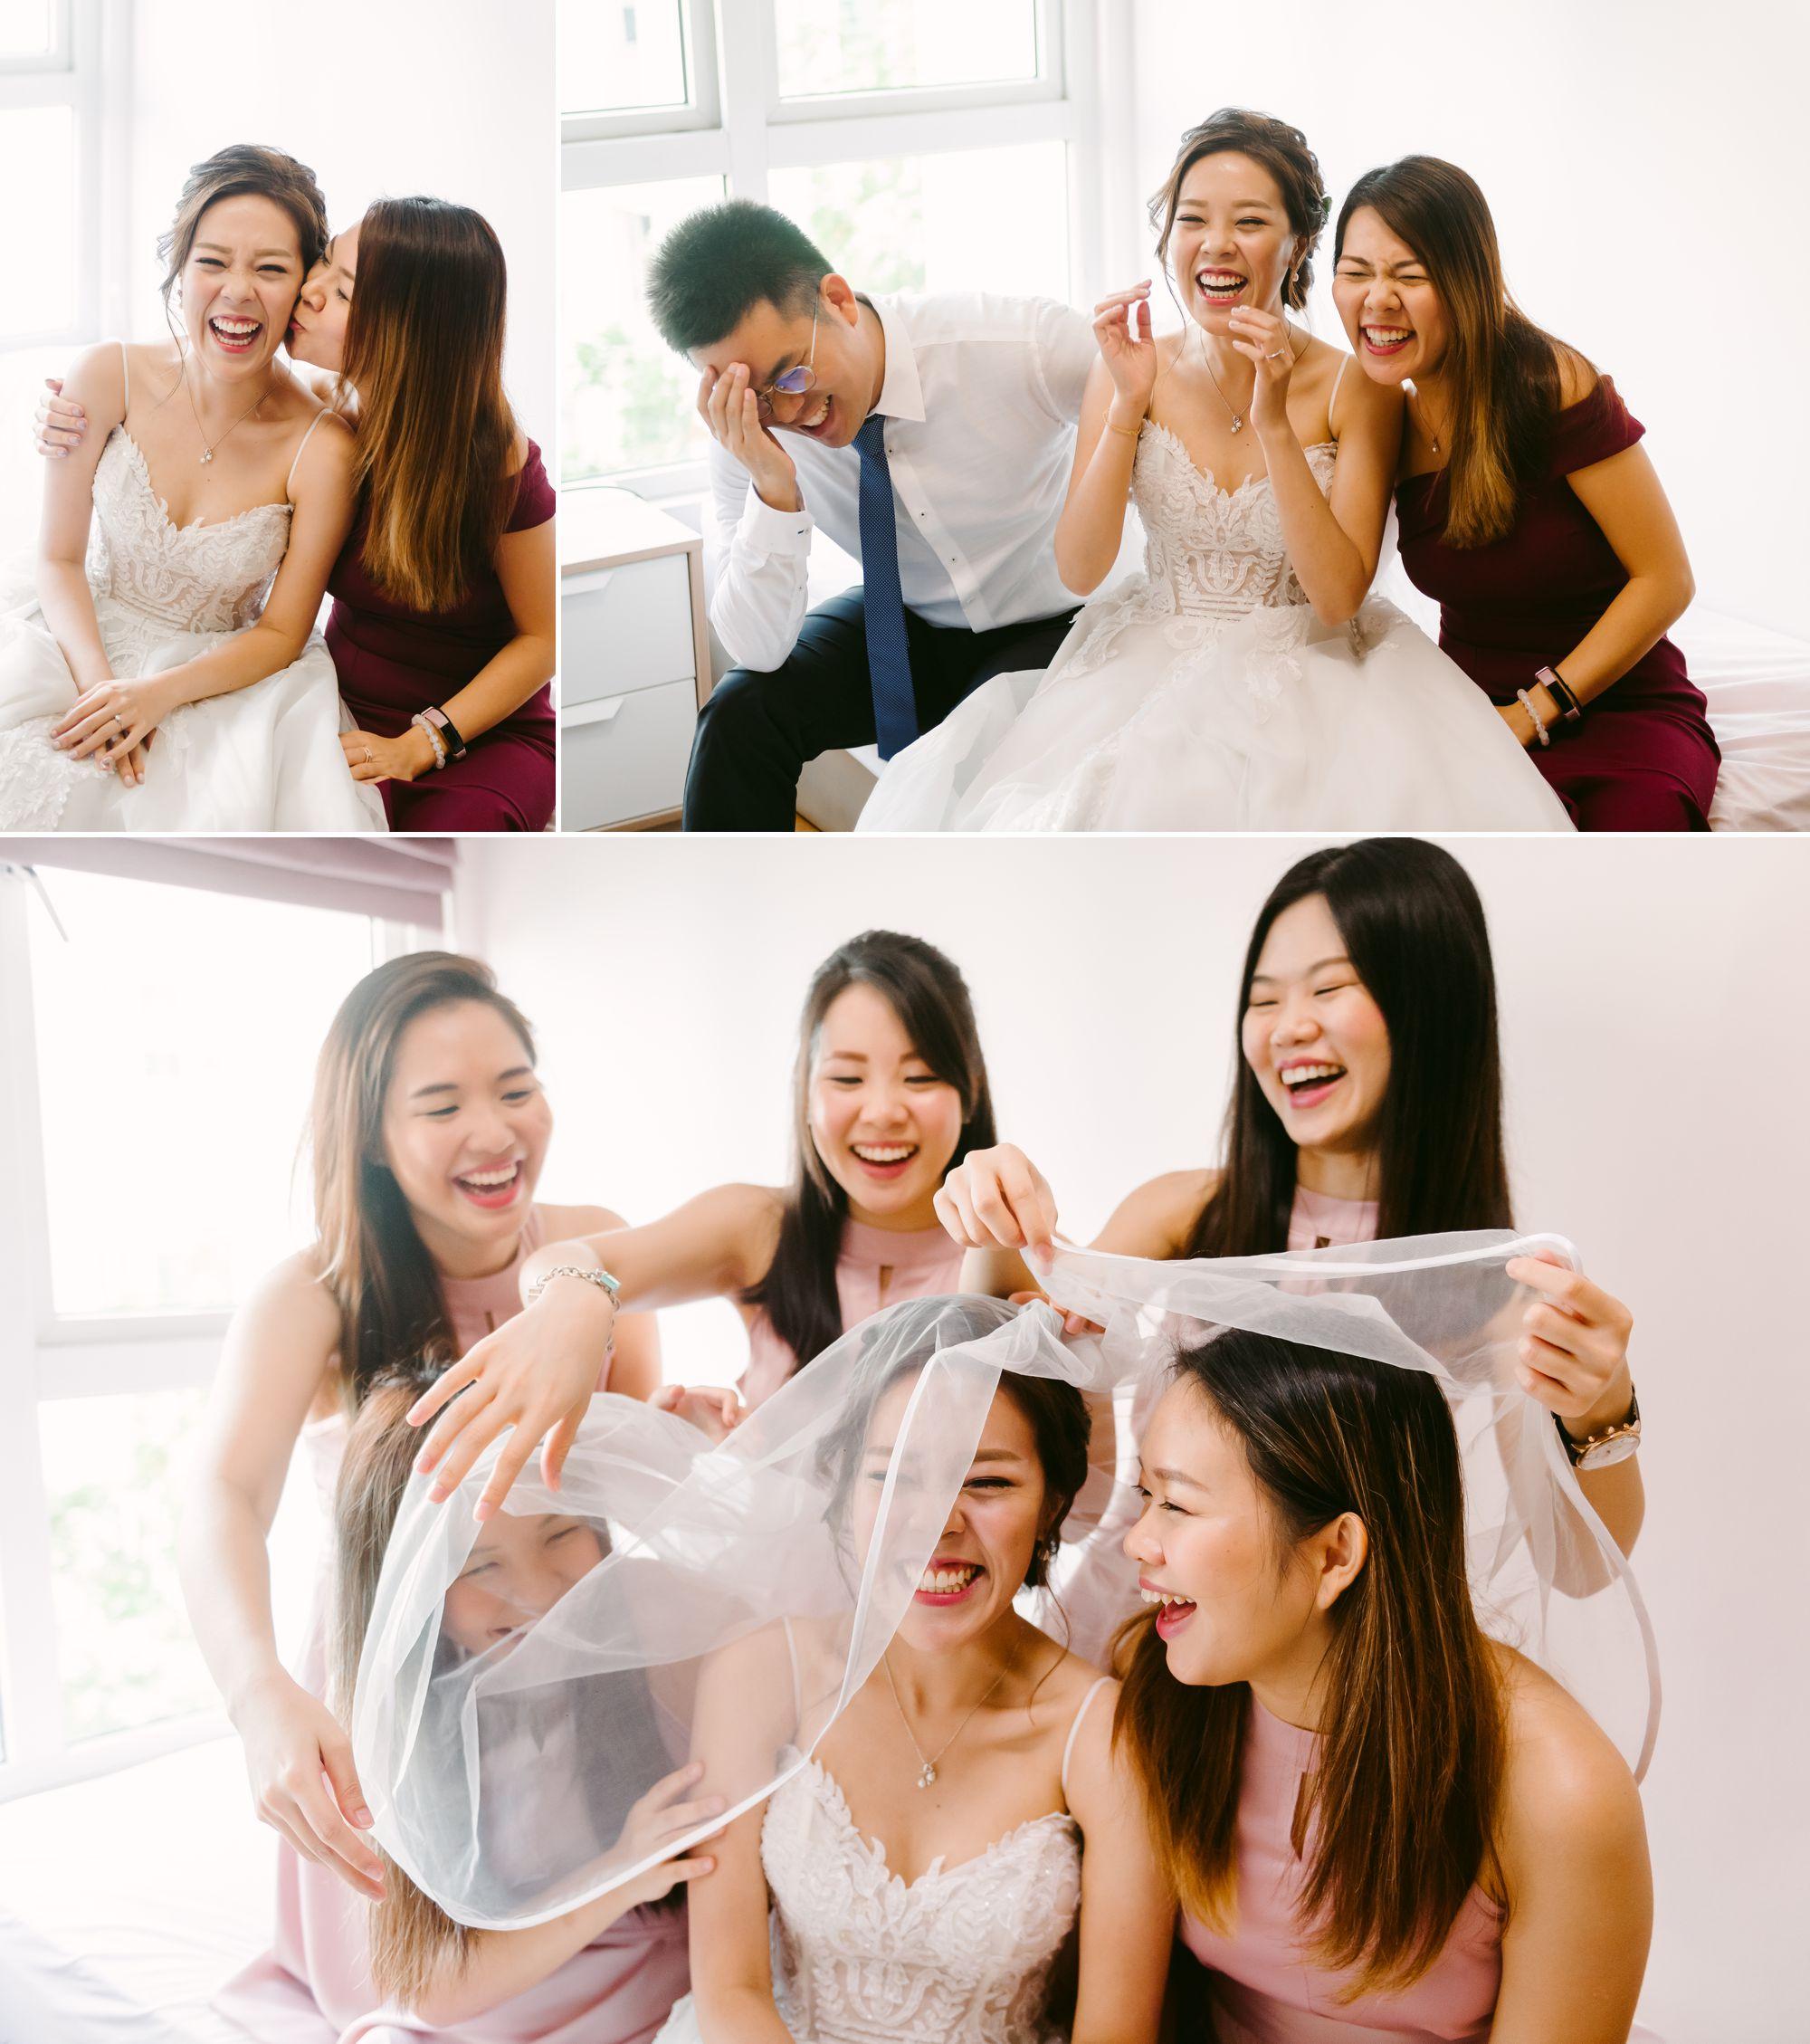 conrad_wedding_Singapore_ 6.jpg